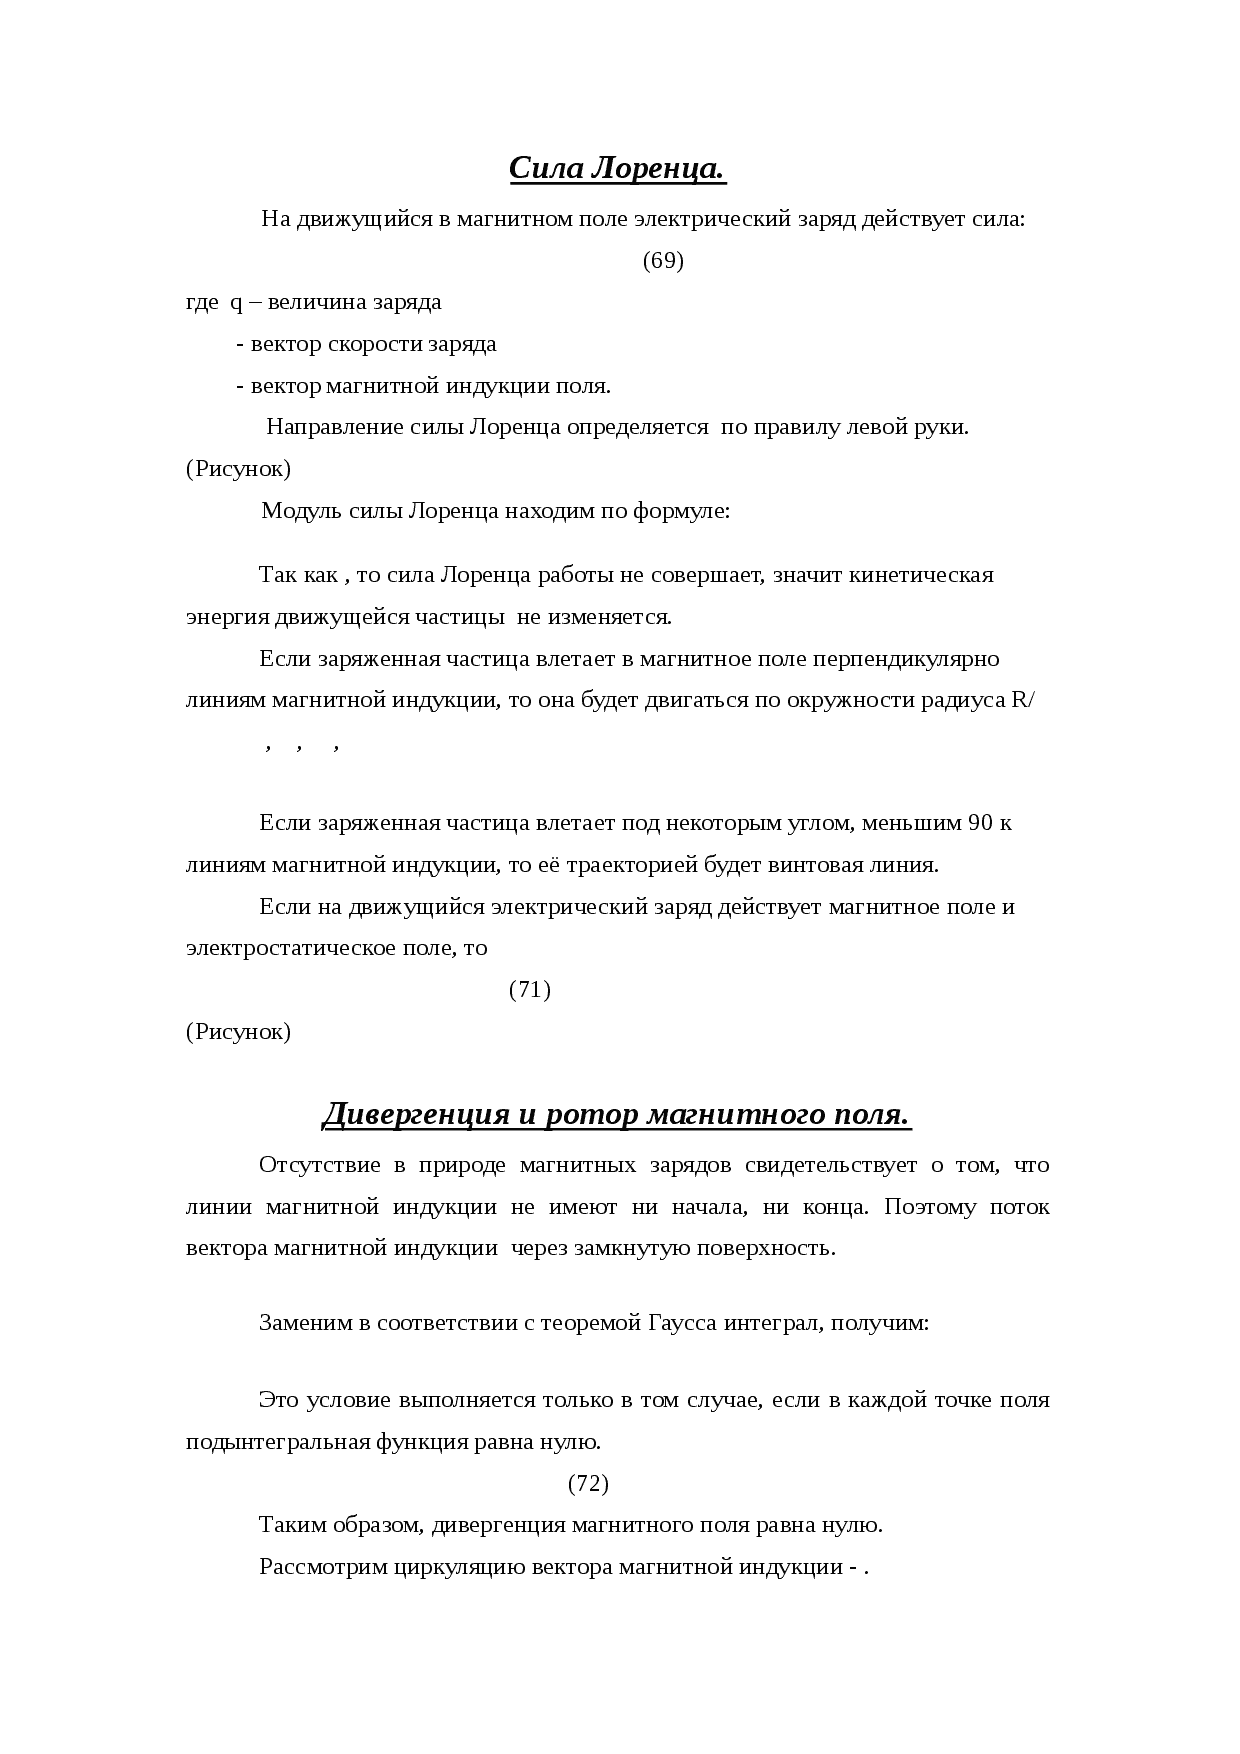 Физика 11 класс: урок №3. сила лоренца